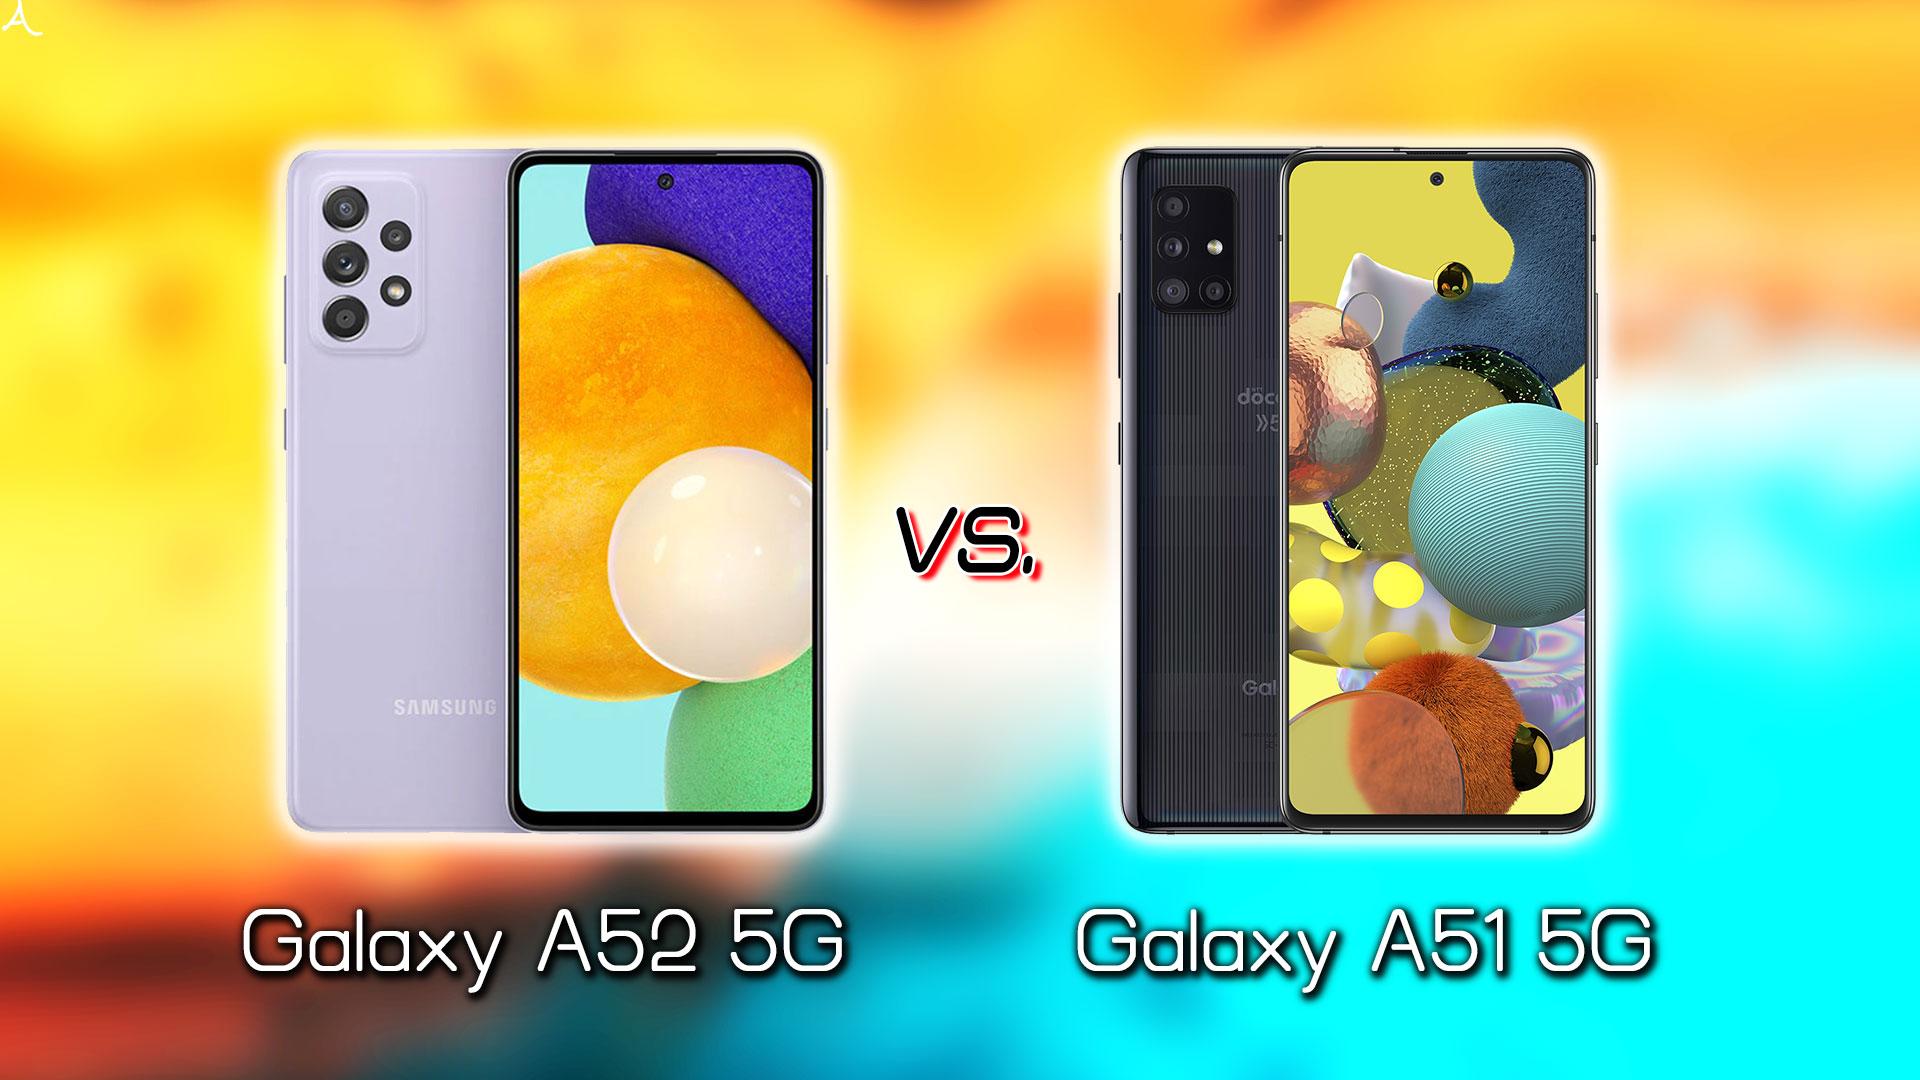 「Galaxy A52 5G」と「Galaxy A51 5G」の違いを比較:どっちを買う?